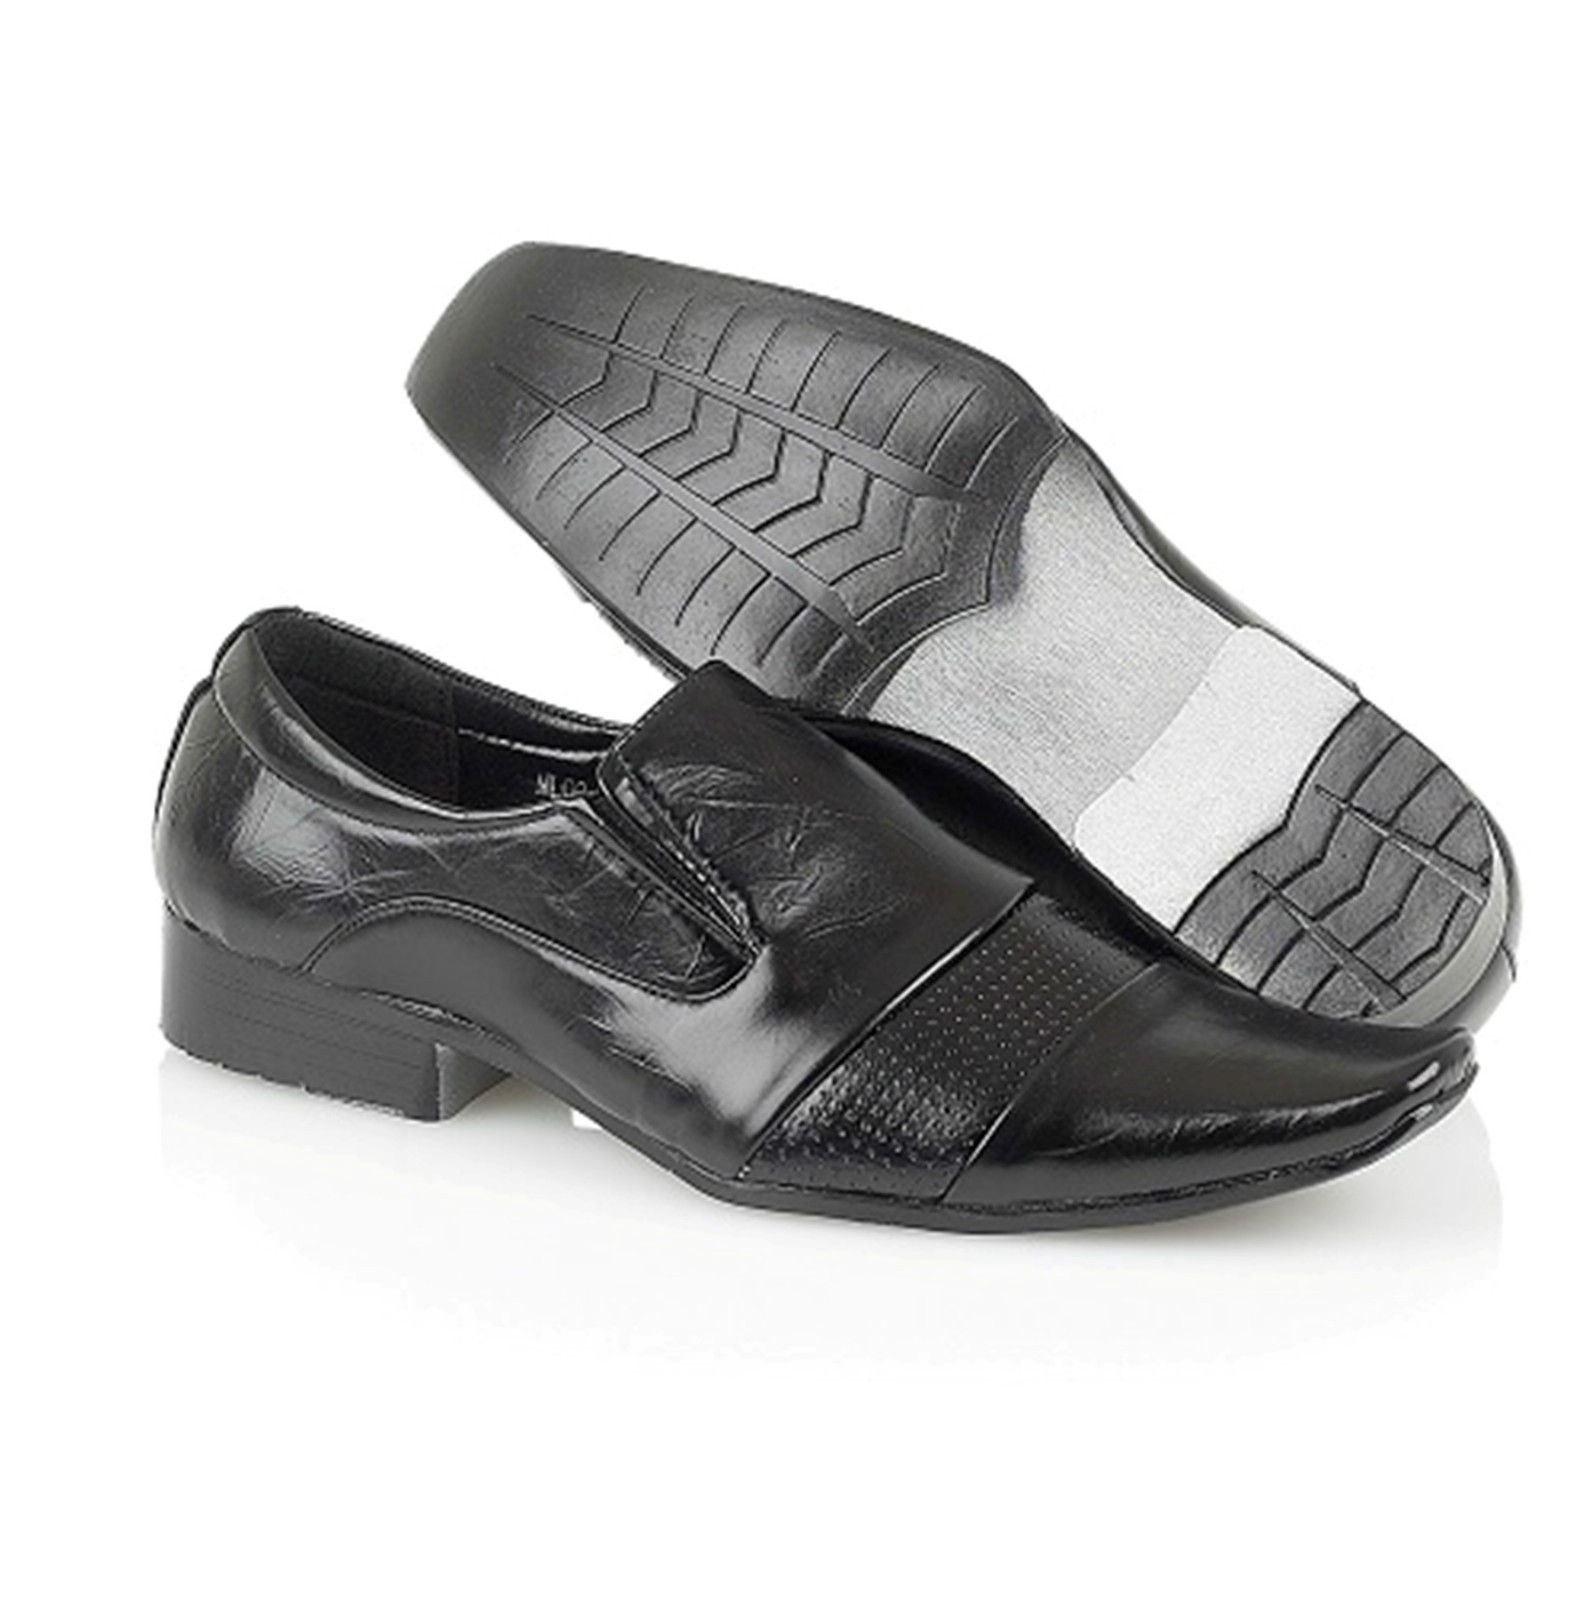 Casual Wedding Shoes 028 - Casual Wedding Shoes